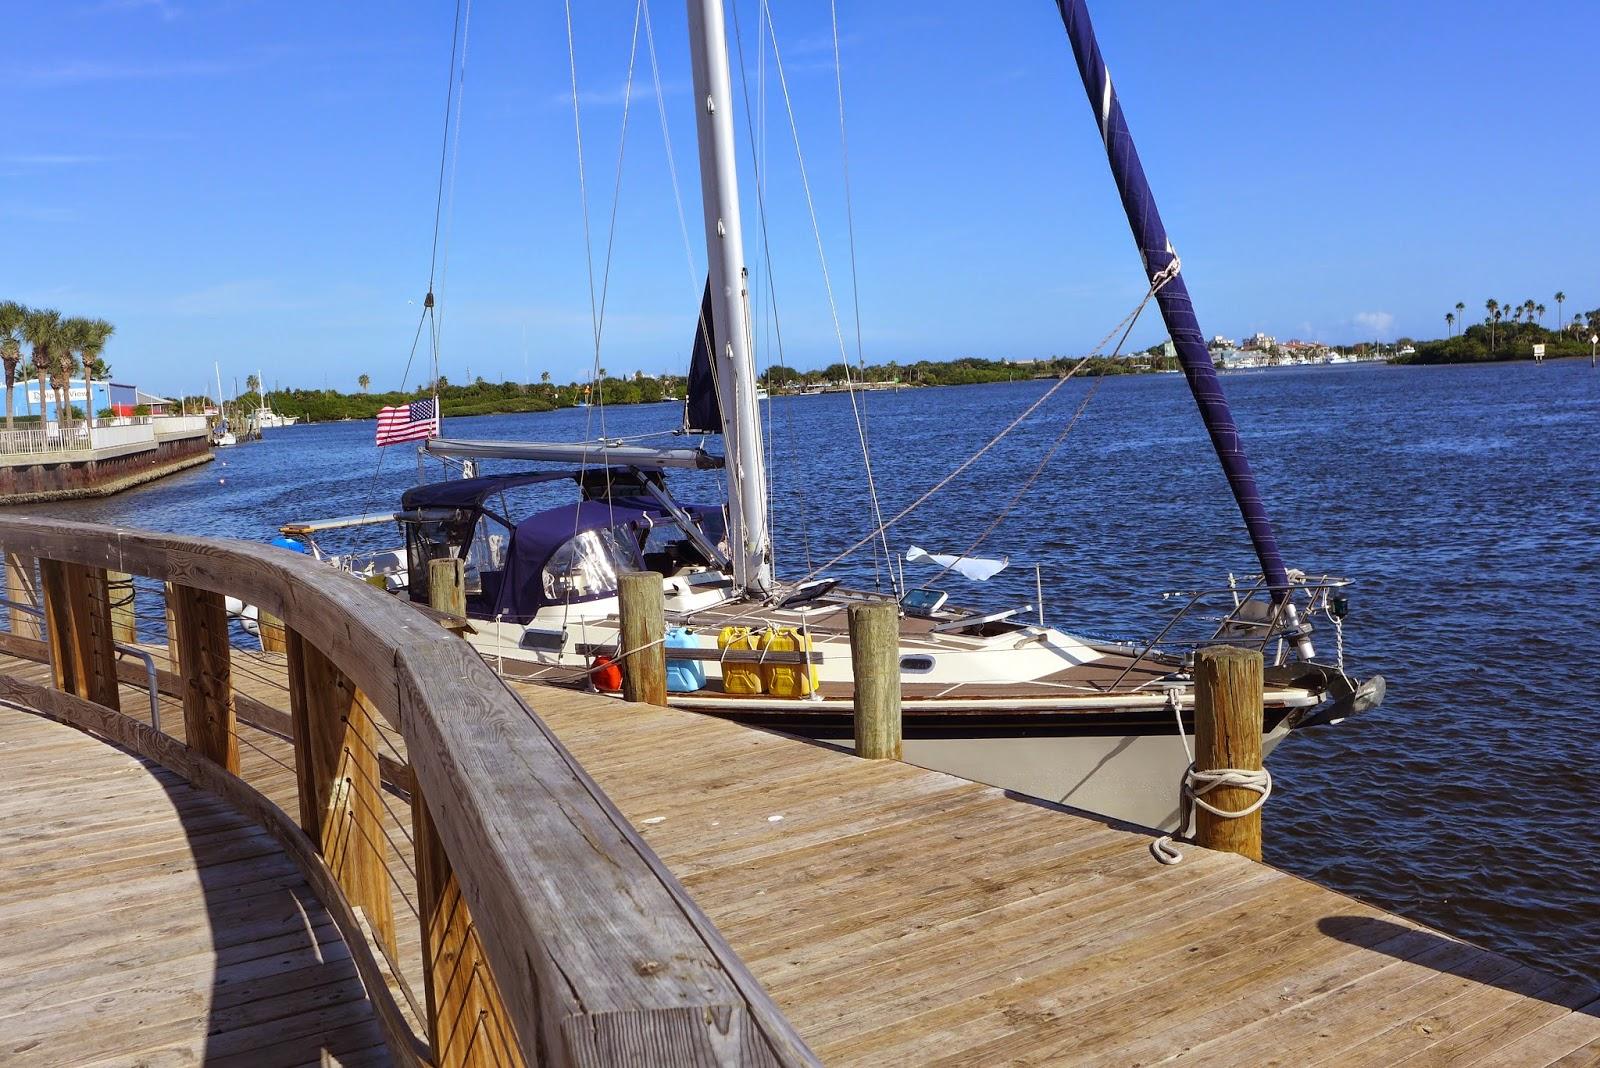 Seven Seas Marina Daytona Beach Shores